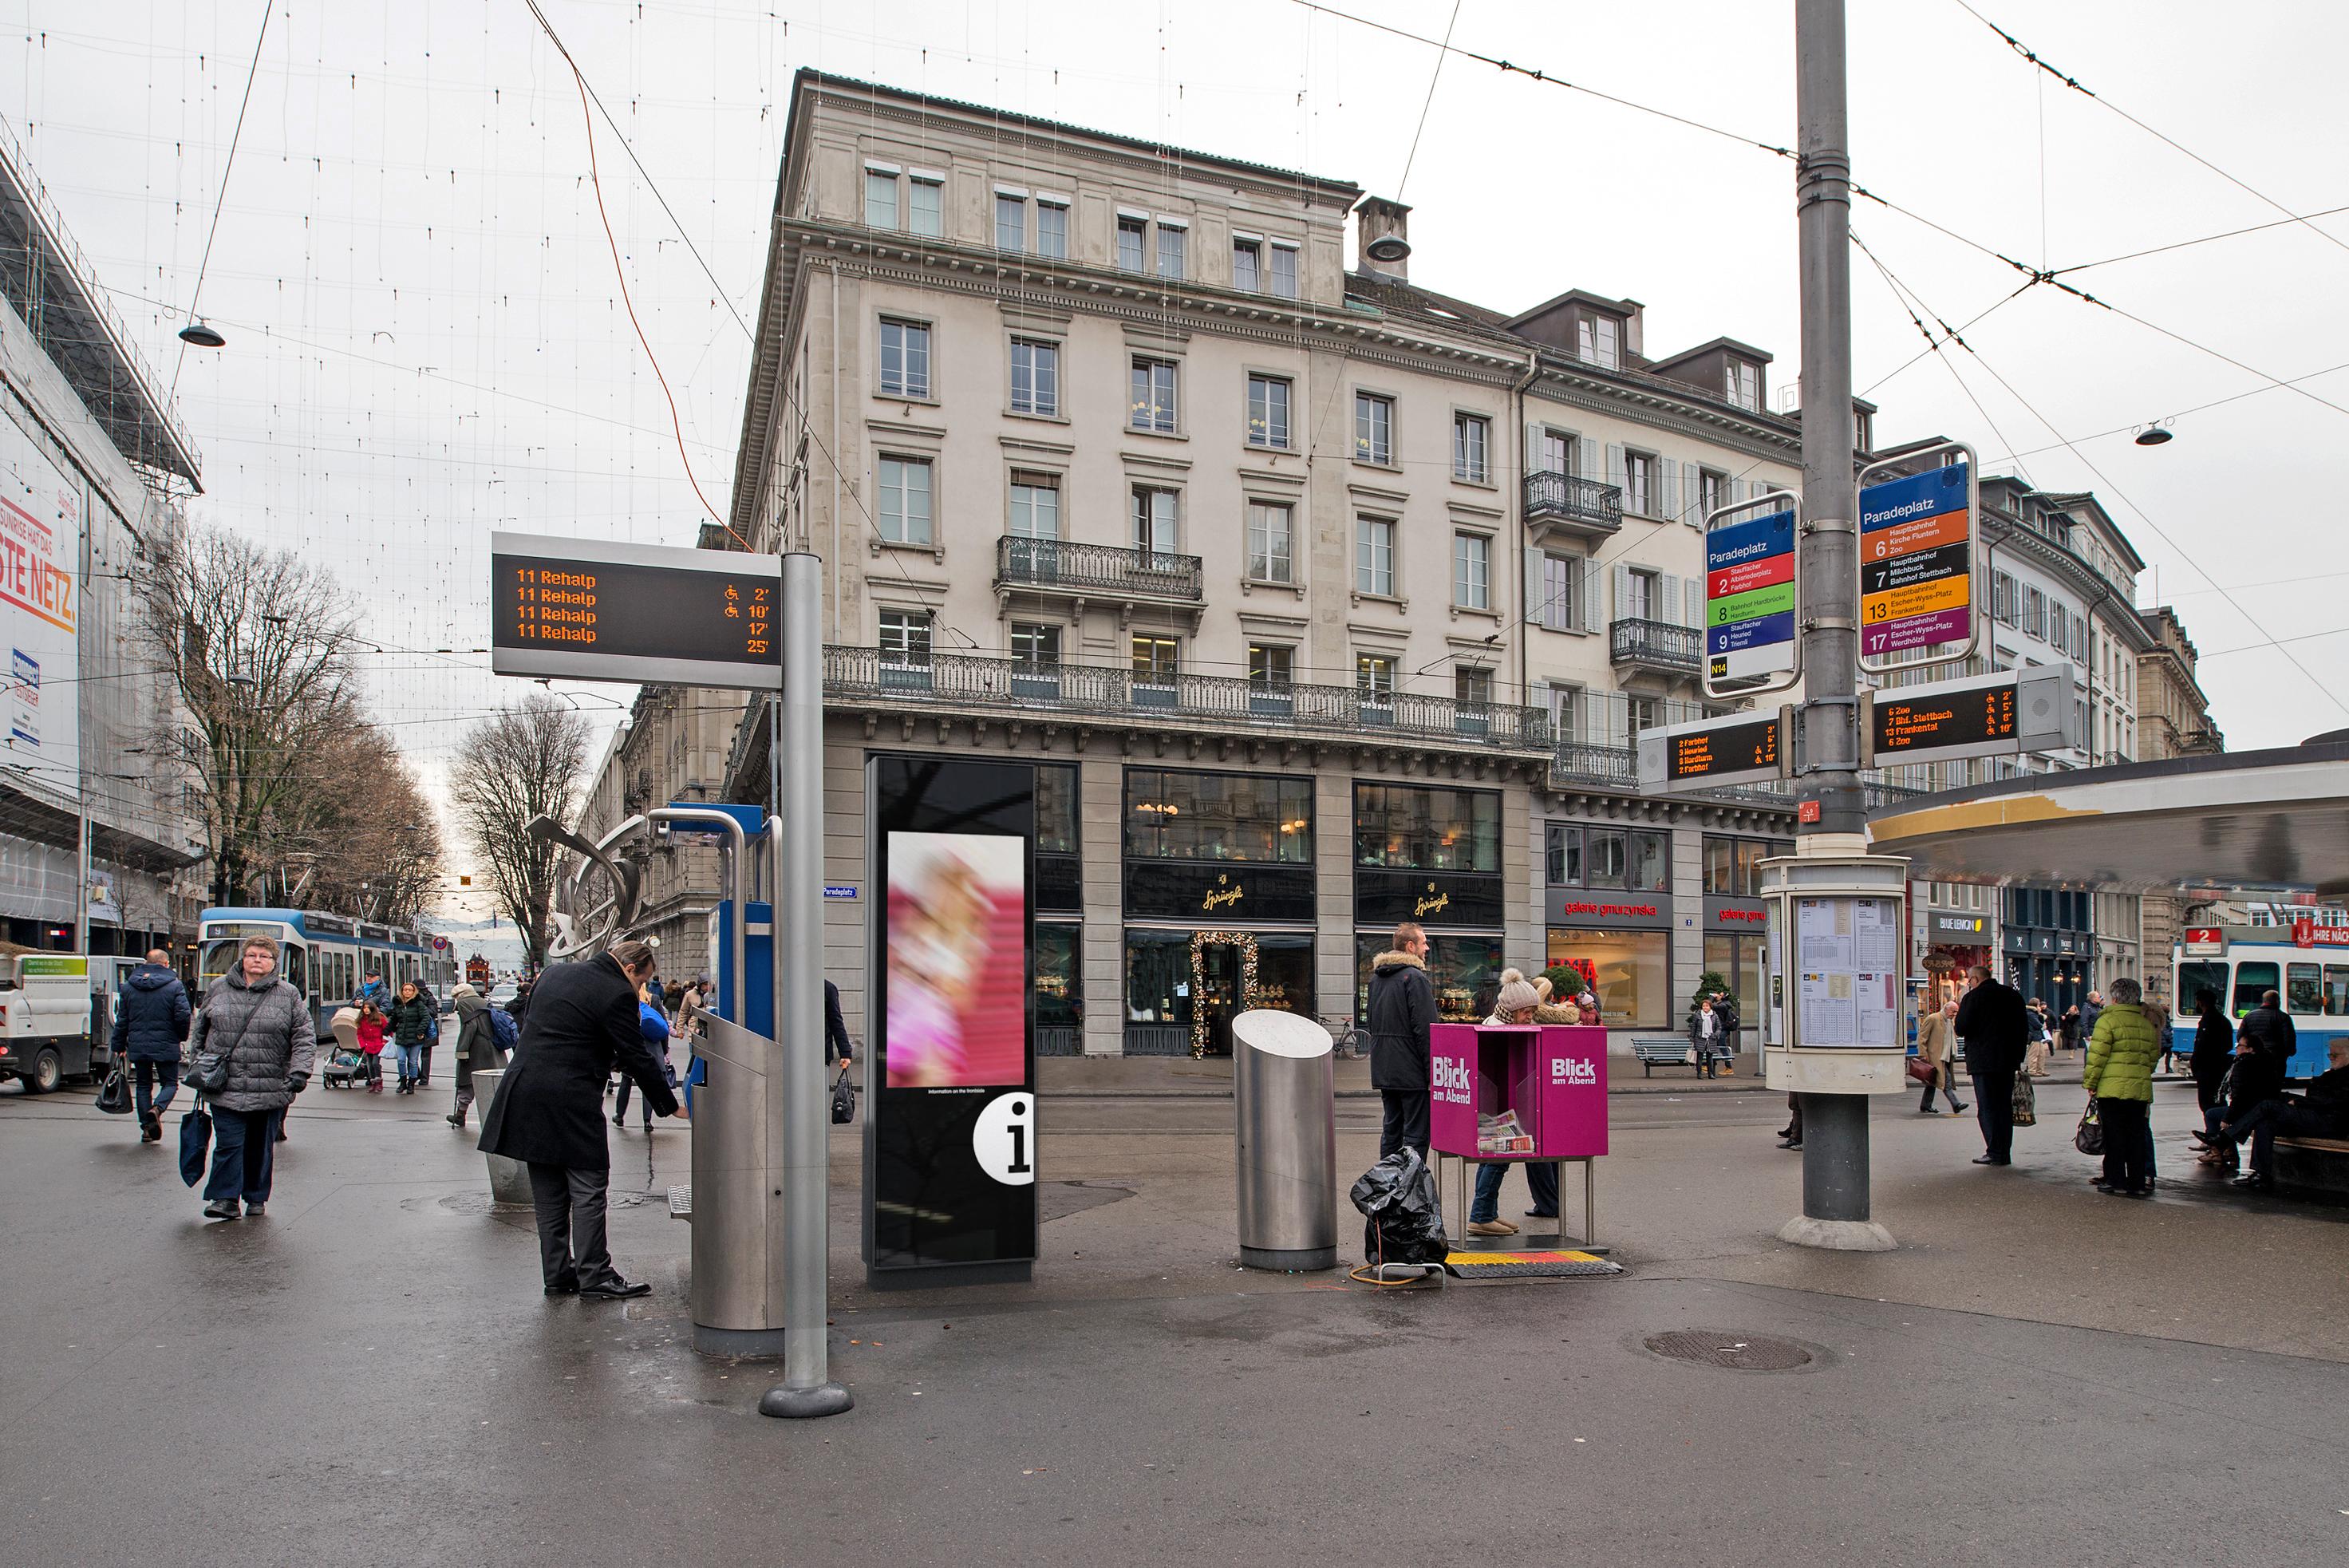 180712_paradeplatz_werbung